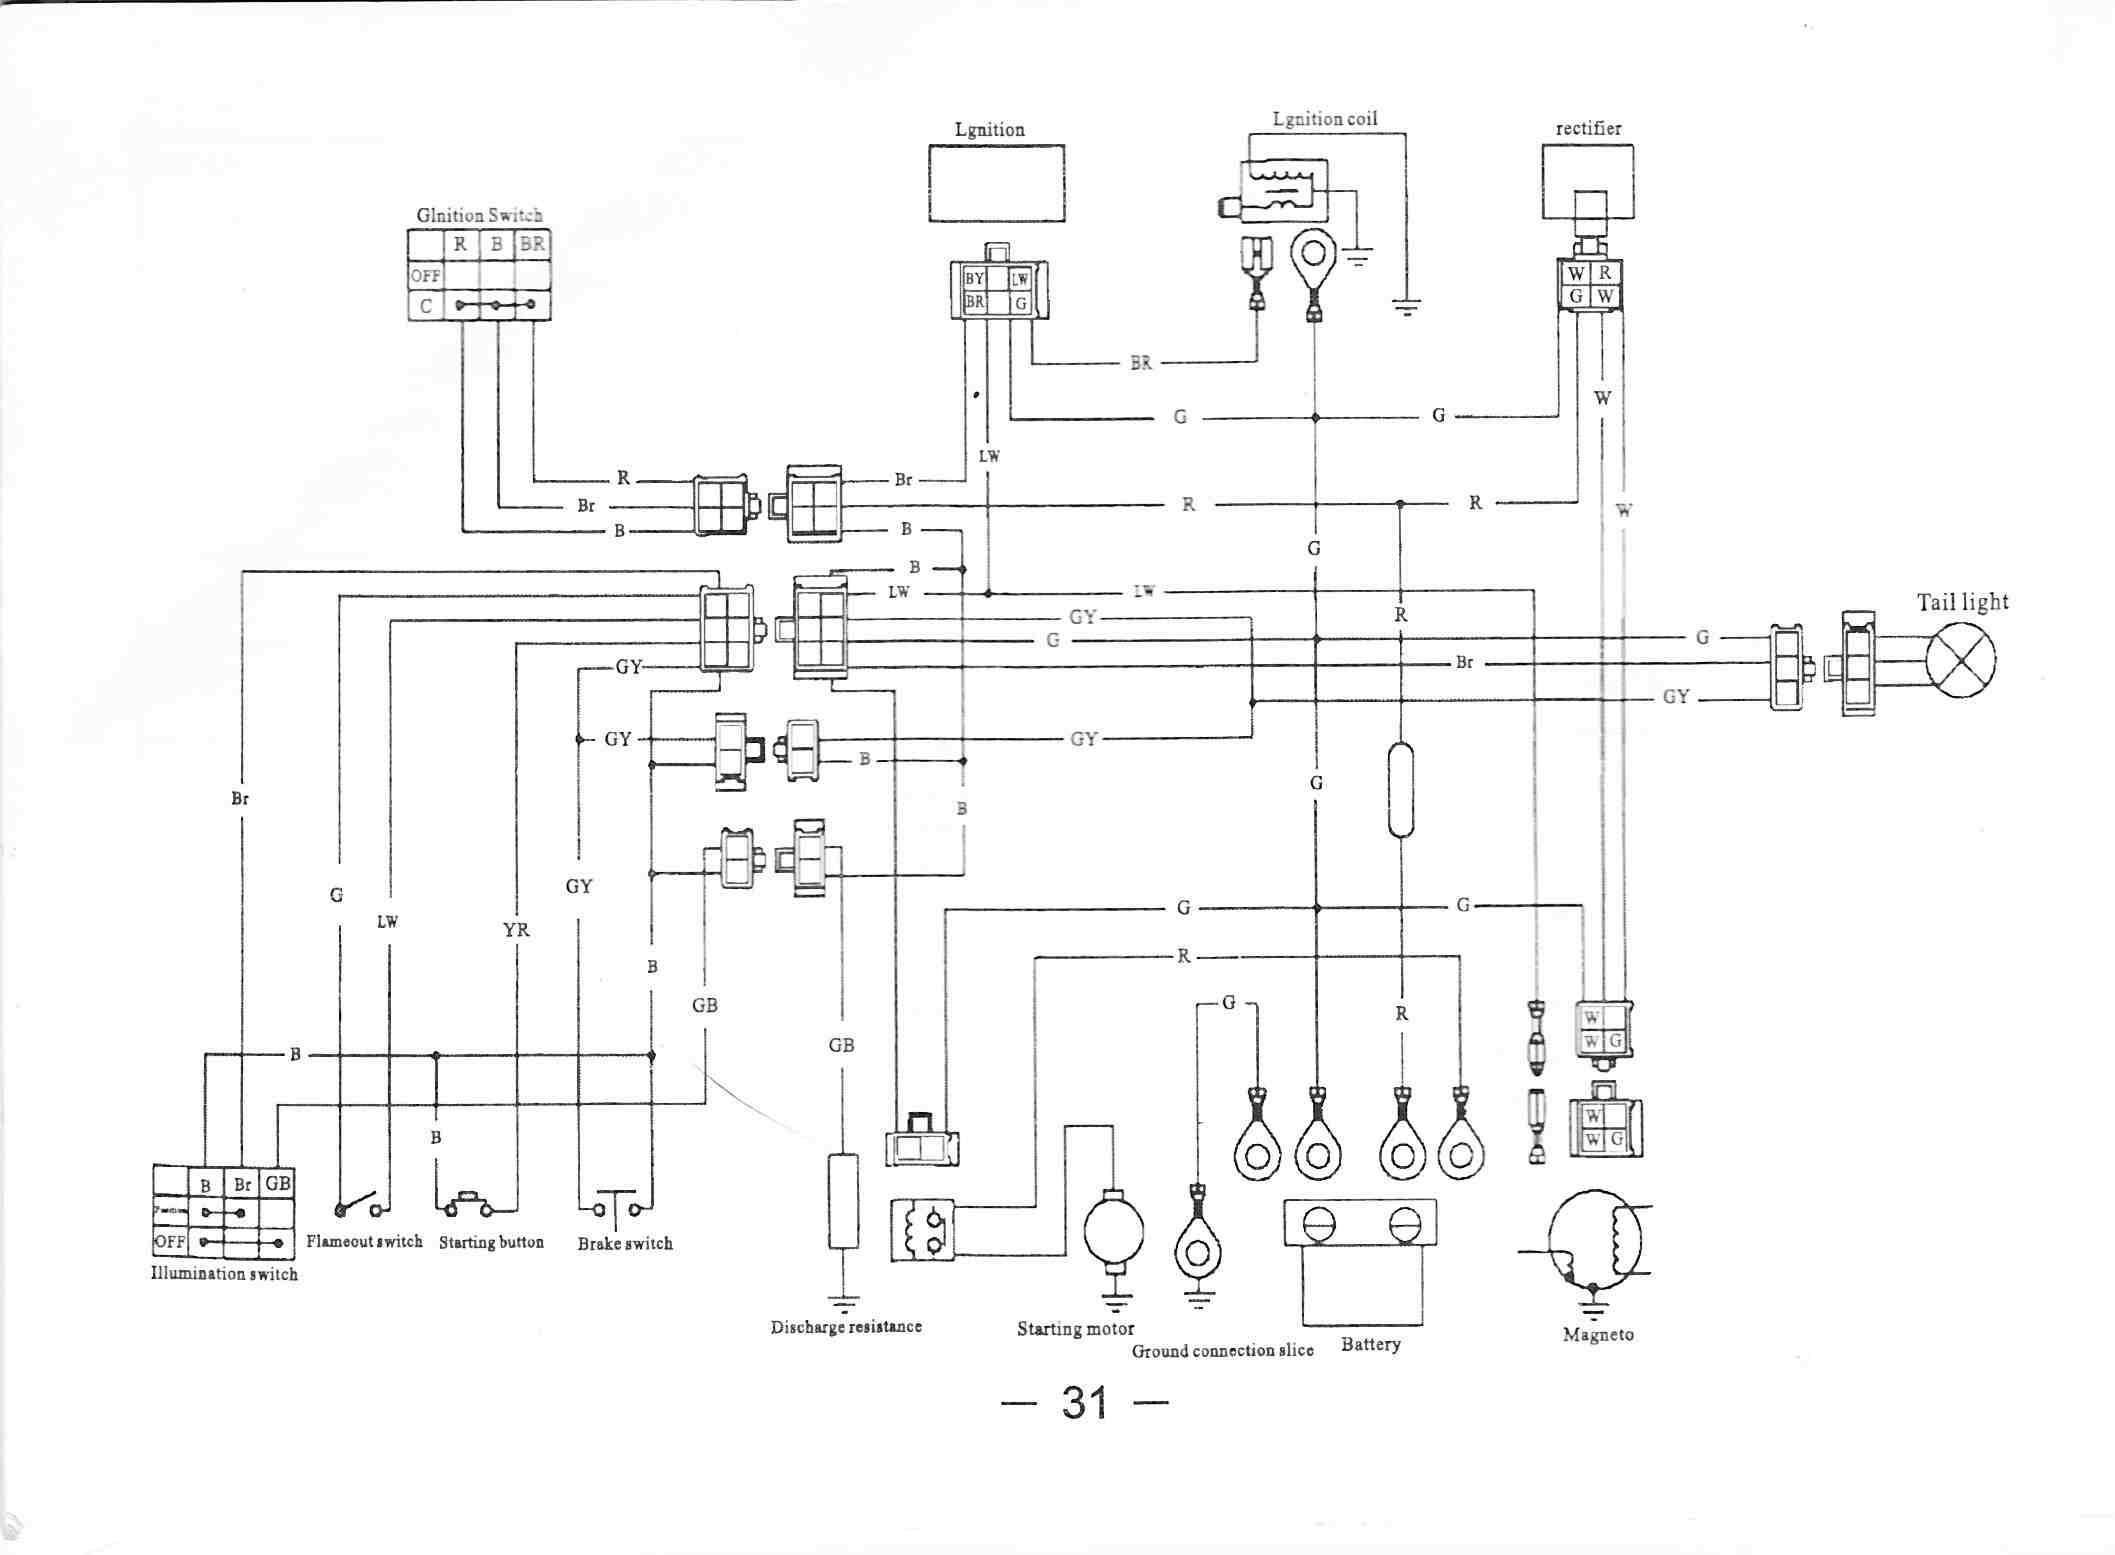 chinese atv starter solenoid wiring diagram wiring diagram atv rh wirings  diagram com atv key switch wiring diagram atv winch solenoid wiring diagram